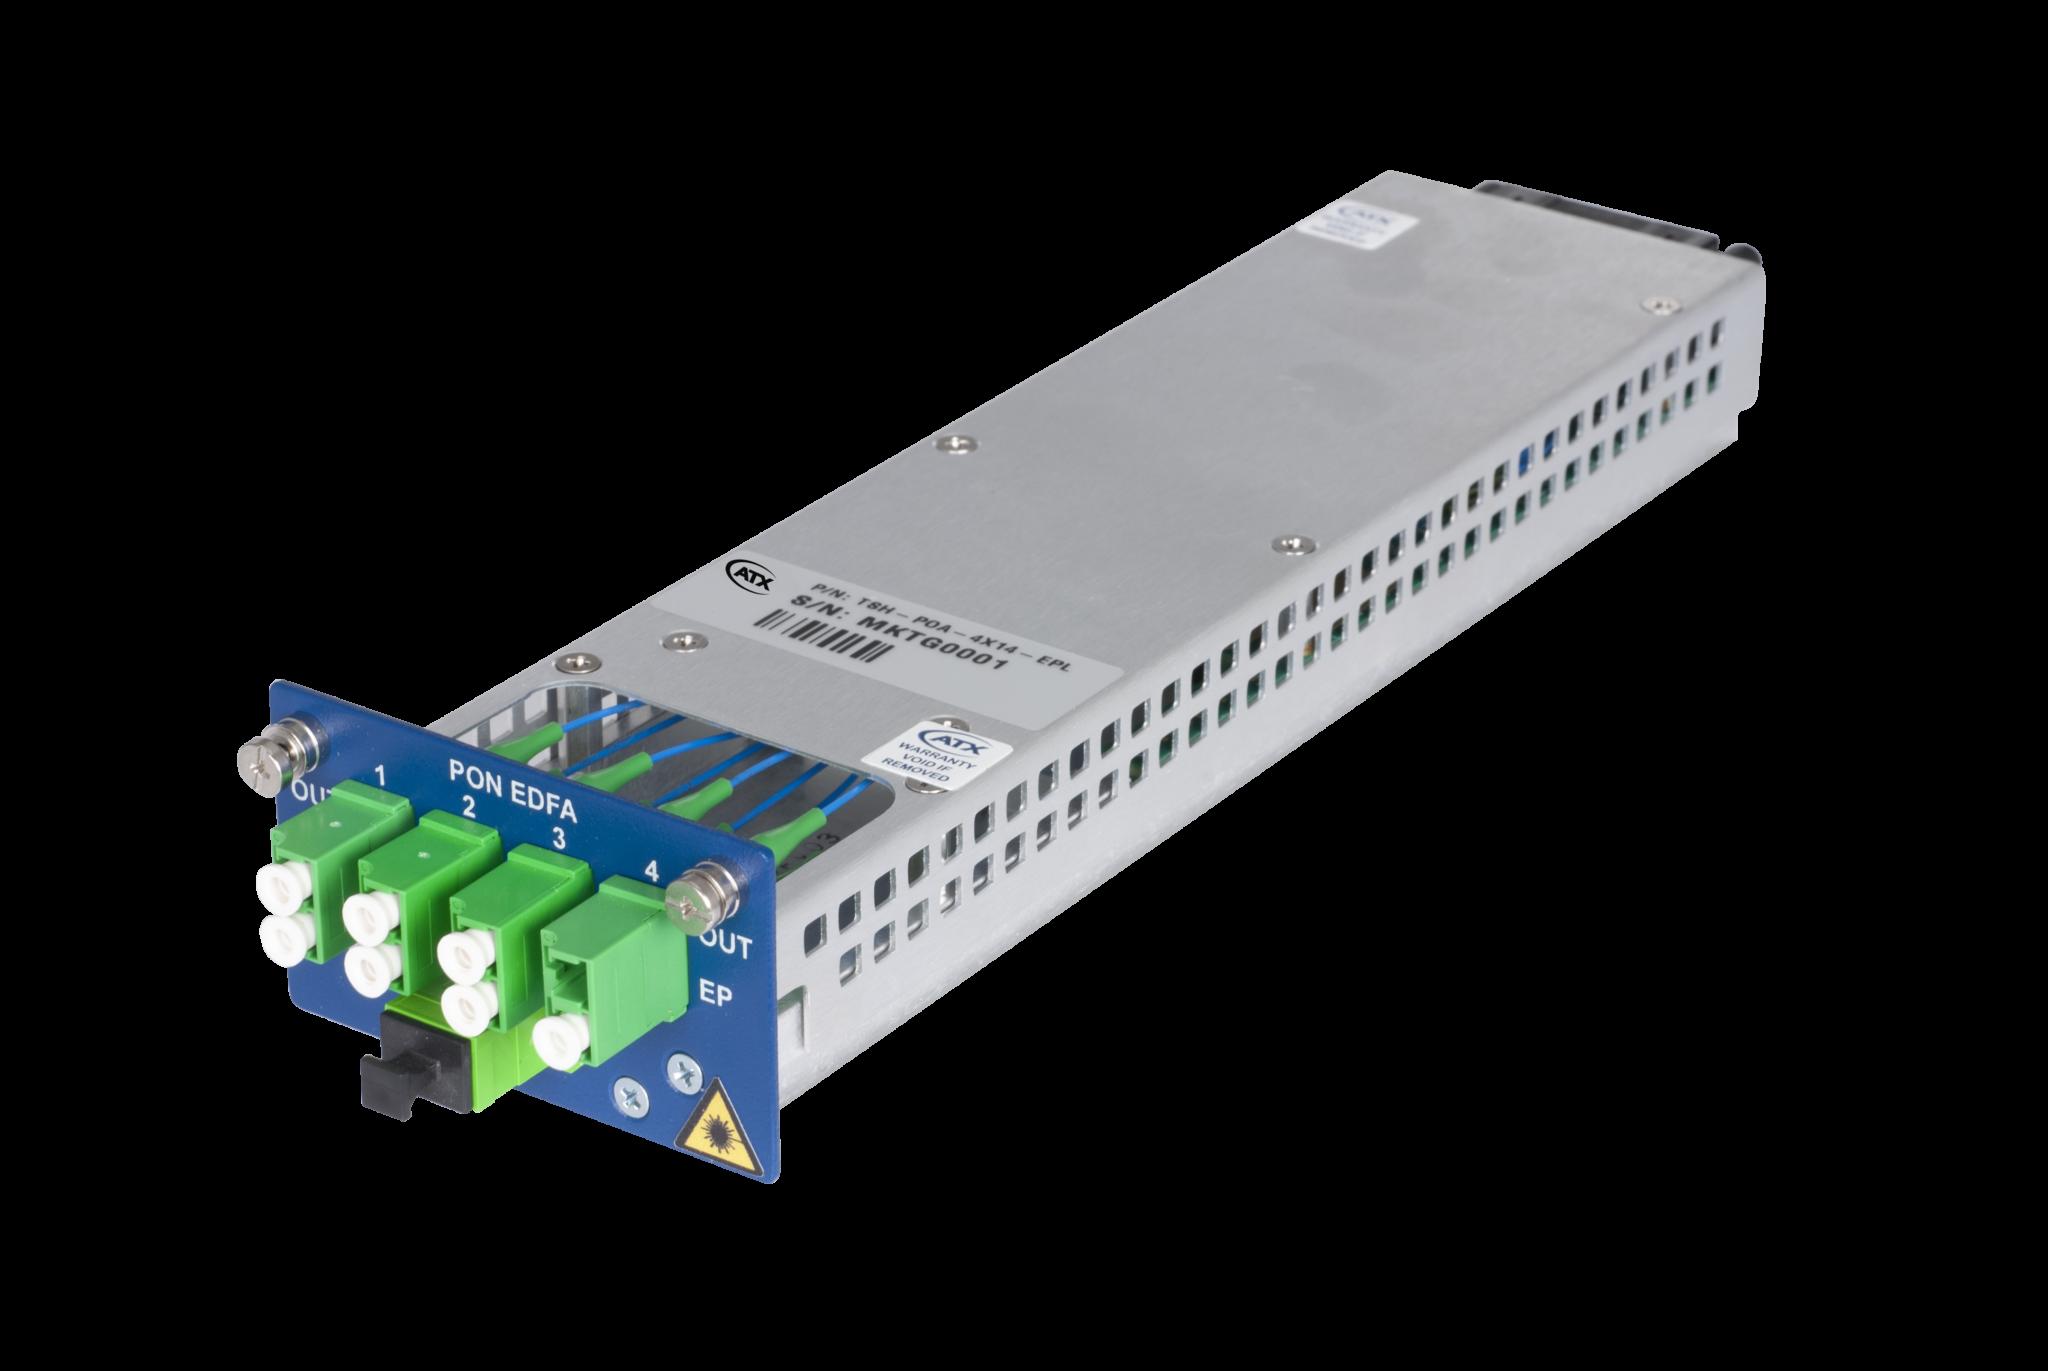 EDFA, Optical Amplifiers